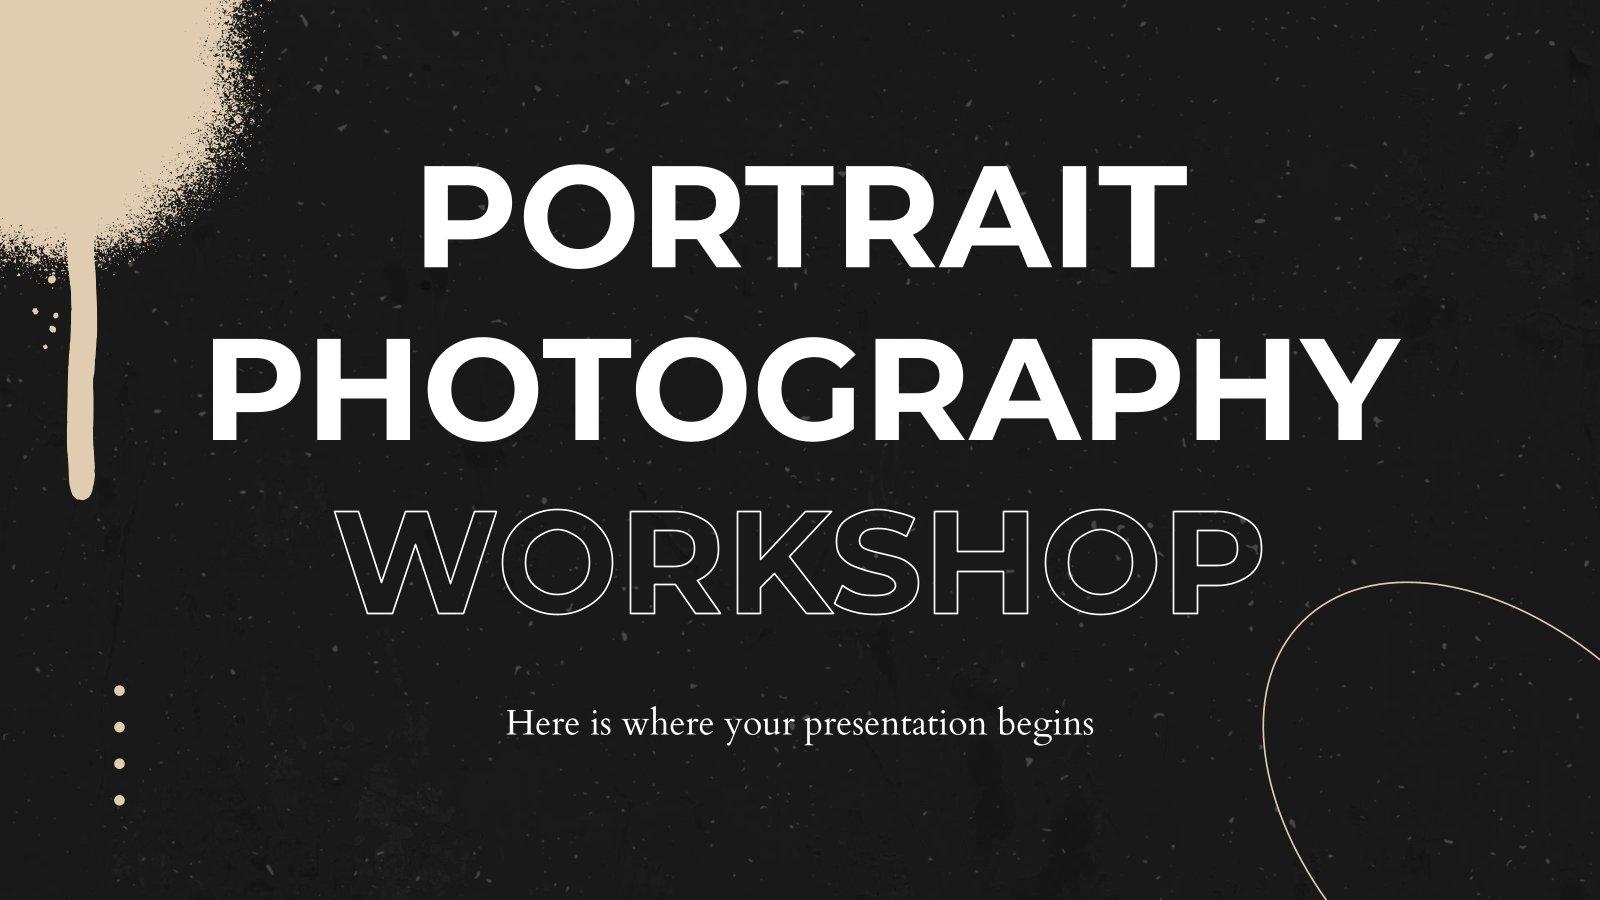 Portrait Photography Workshop presentation template